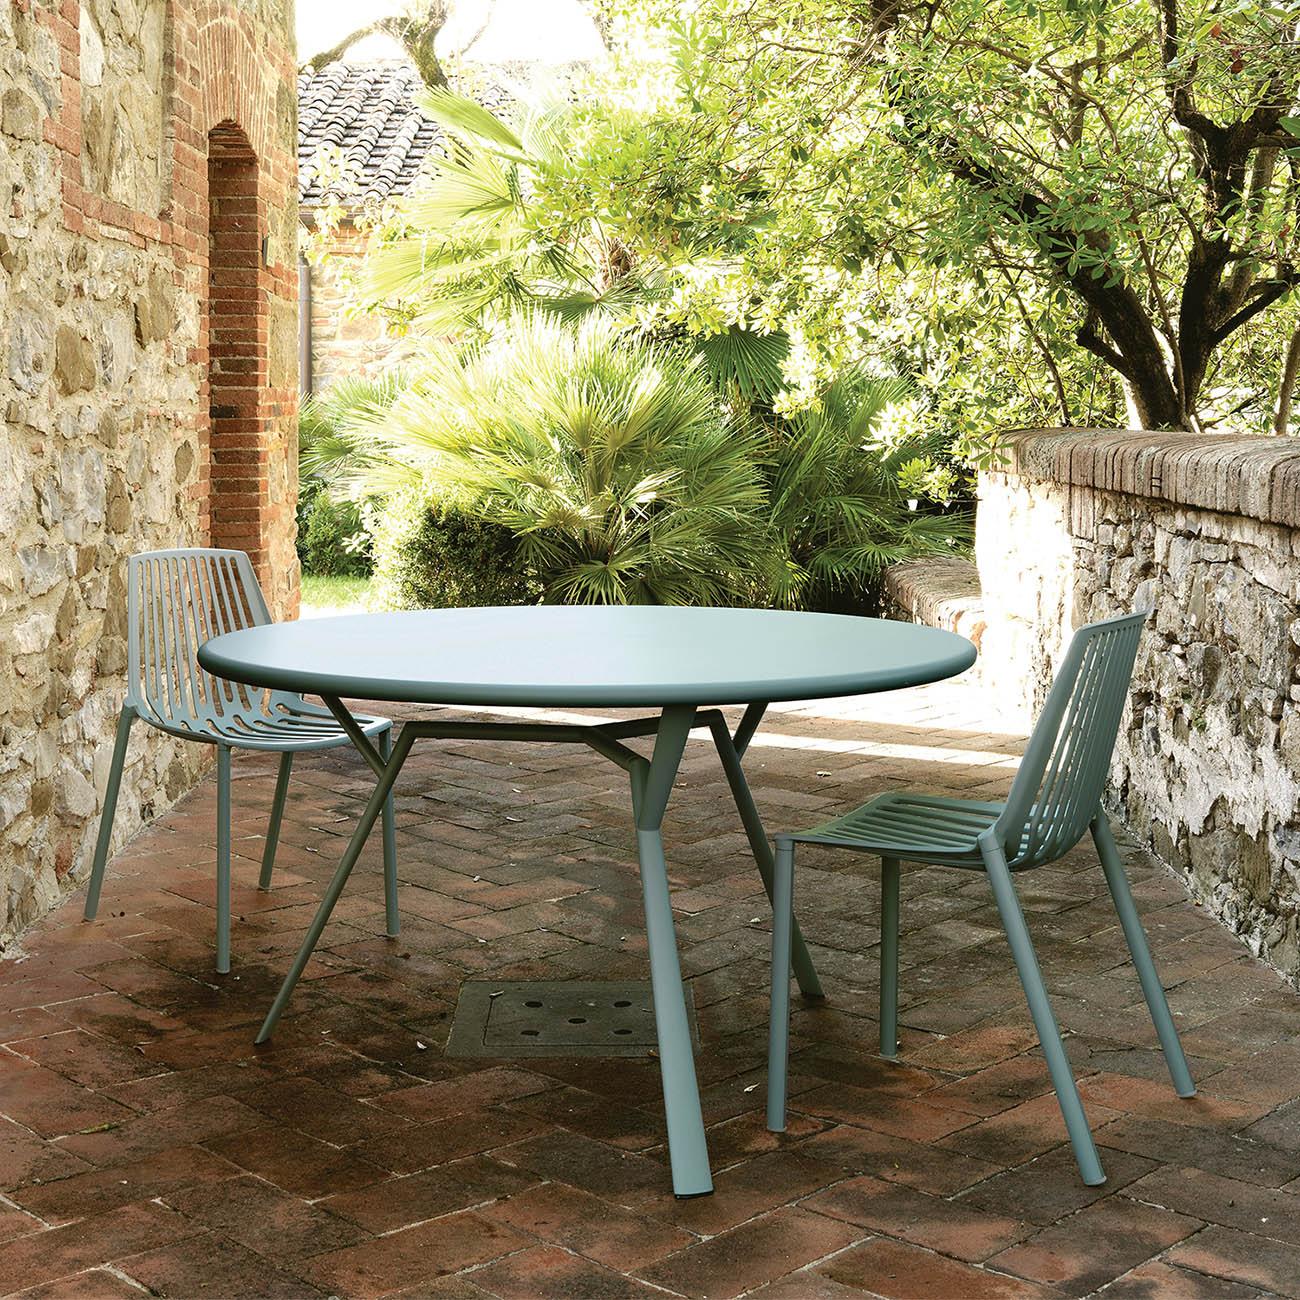 Radice Quadra bord i storleken 130 cm i en miljöbild.